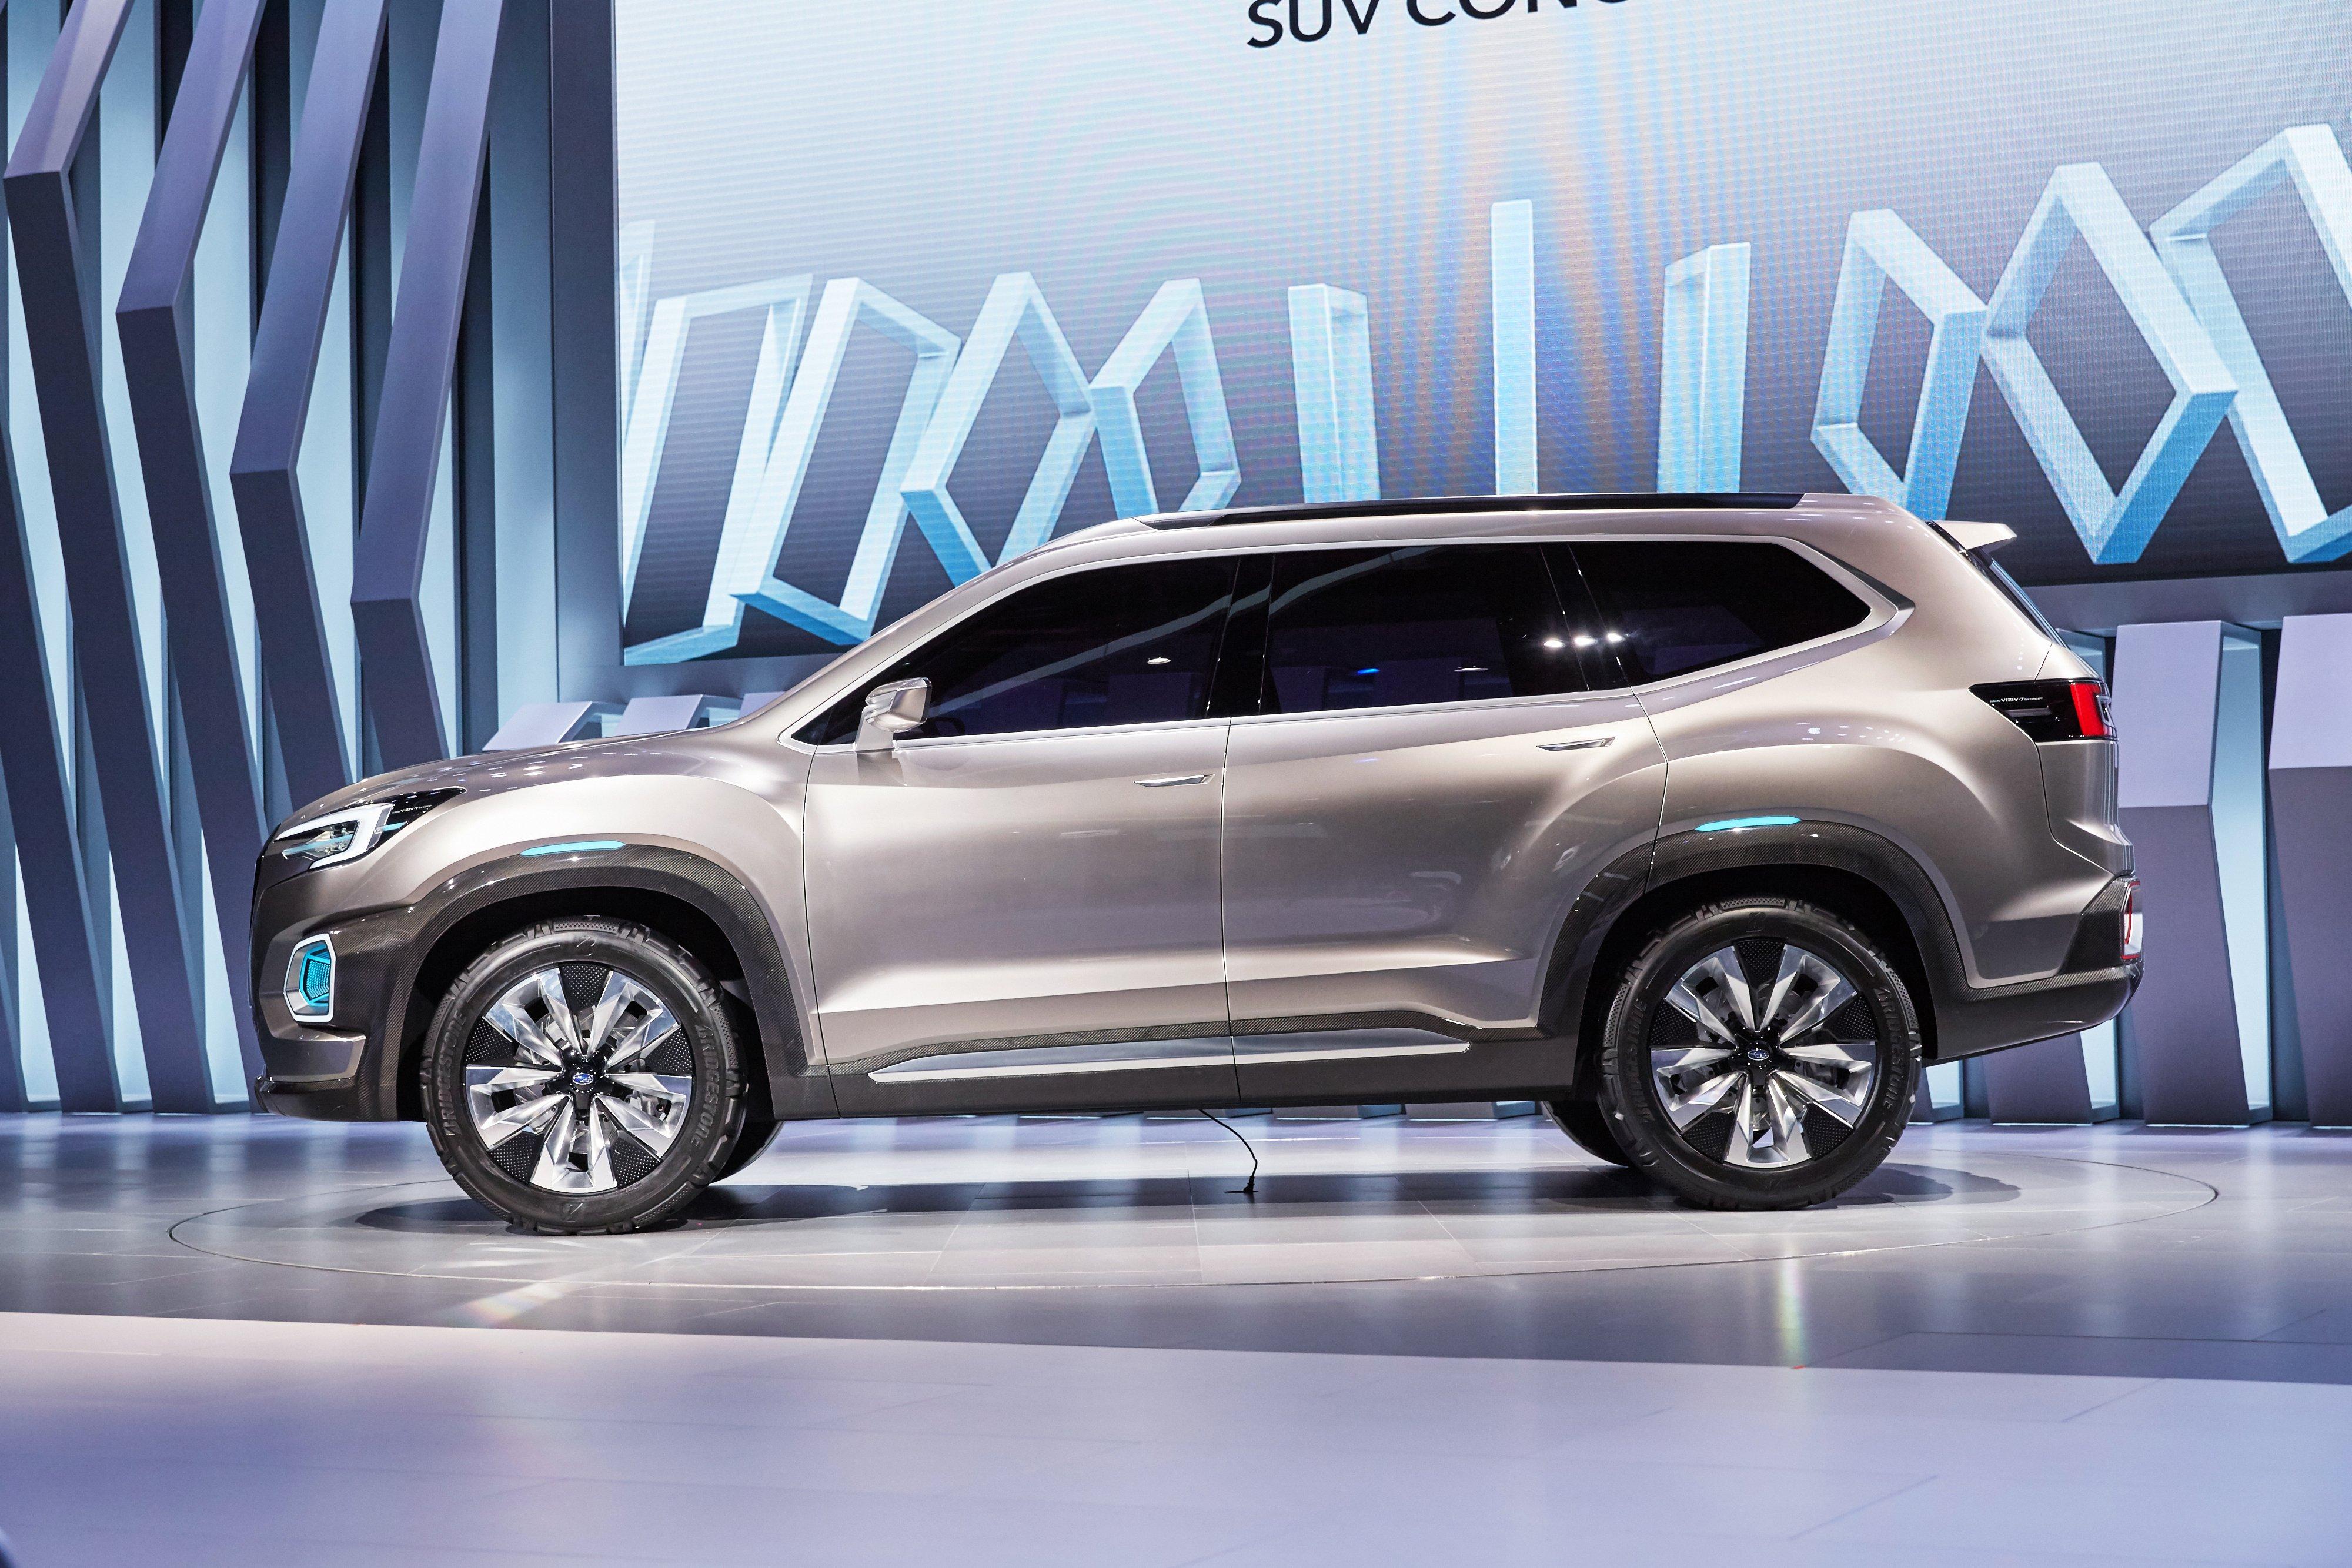 7 Seater Vehicles >> Subaru Viziv-7 Concept debuts – seven-seater SUV Paul Tan - Image 581349